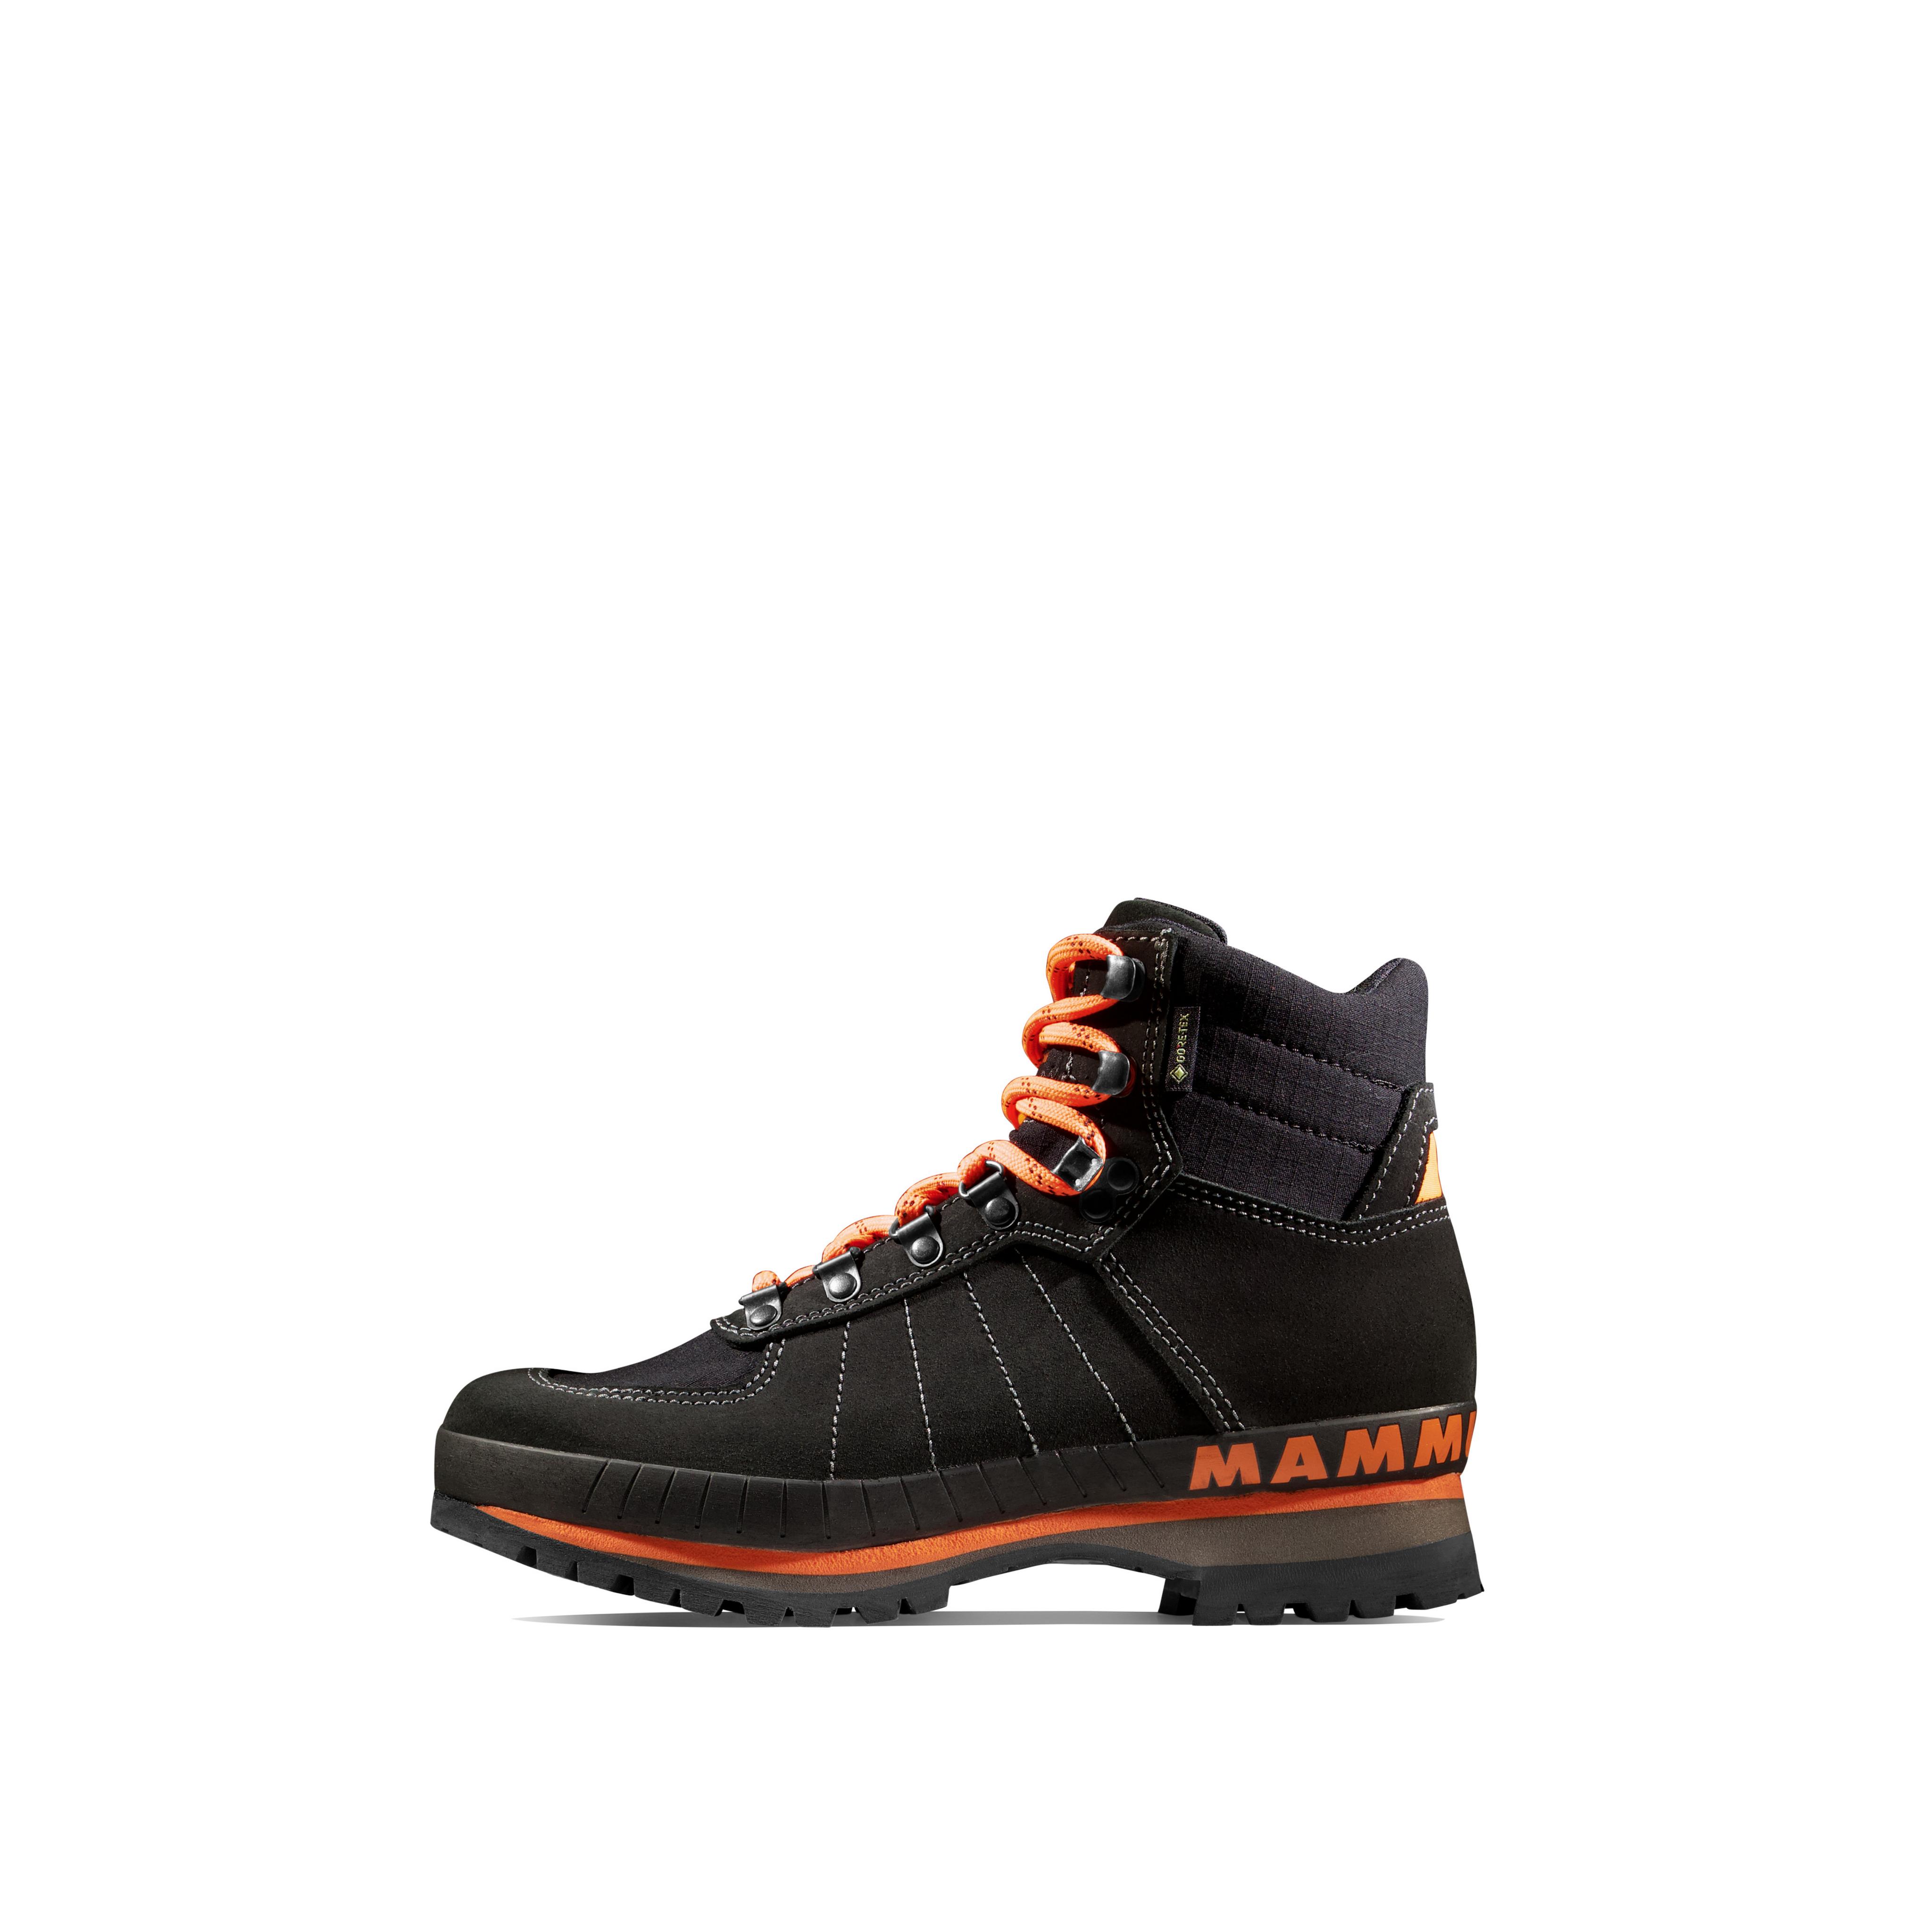 Yatna II High GTX® Women - black-vibrant orange, UK 3.5 thumbnail